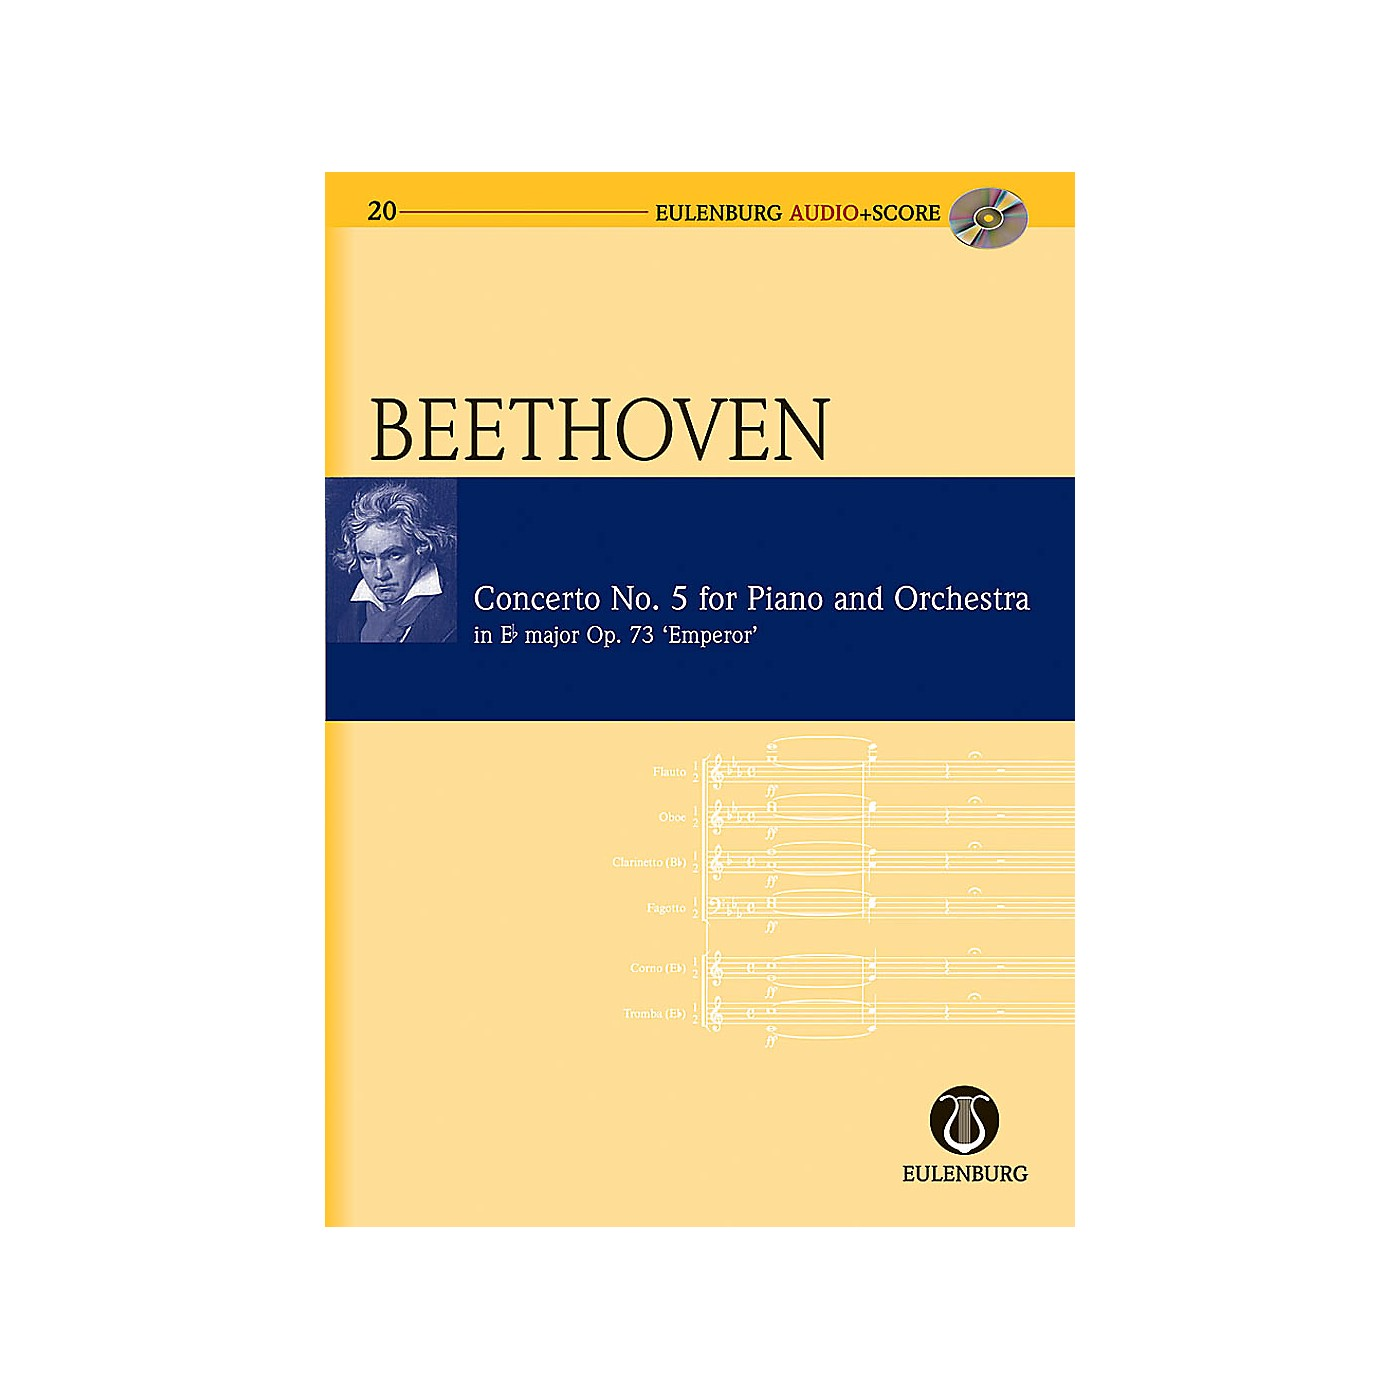 Eulenburg Piano Concerto No. 5 in Eb Major Op. 73 Emperor Concerto Eulenberg Audio plus Score by Beethoven thumbnail